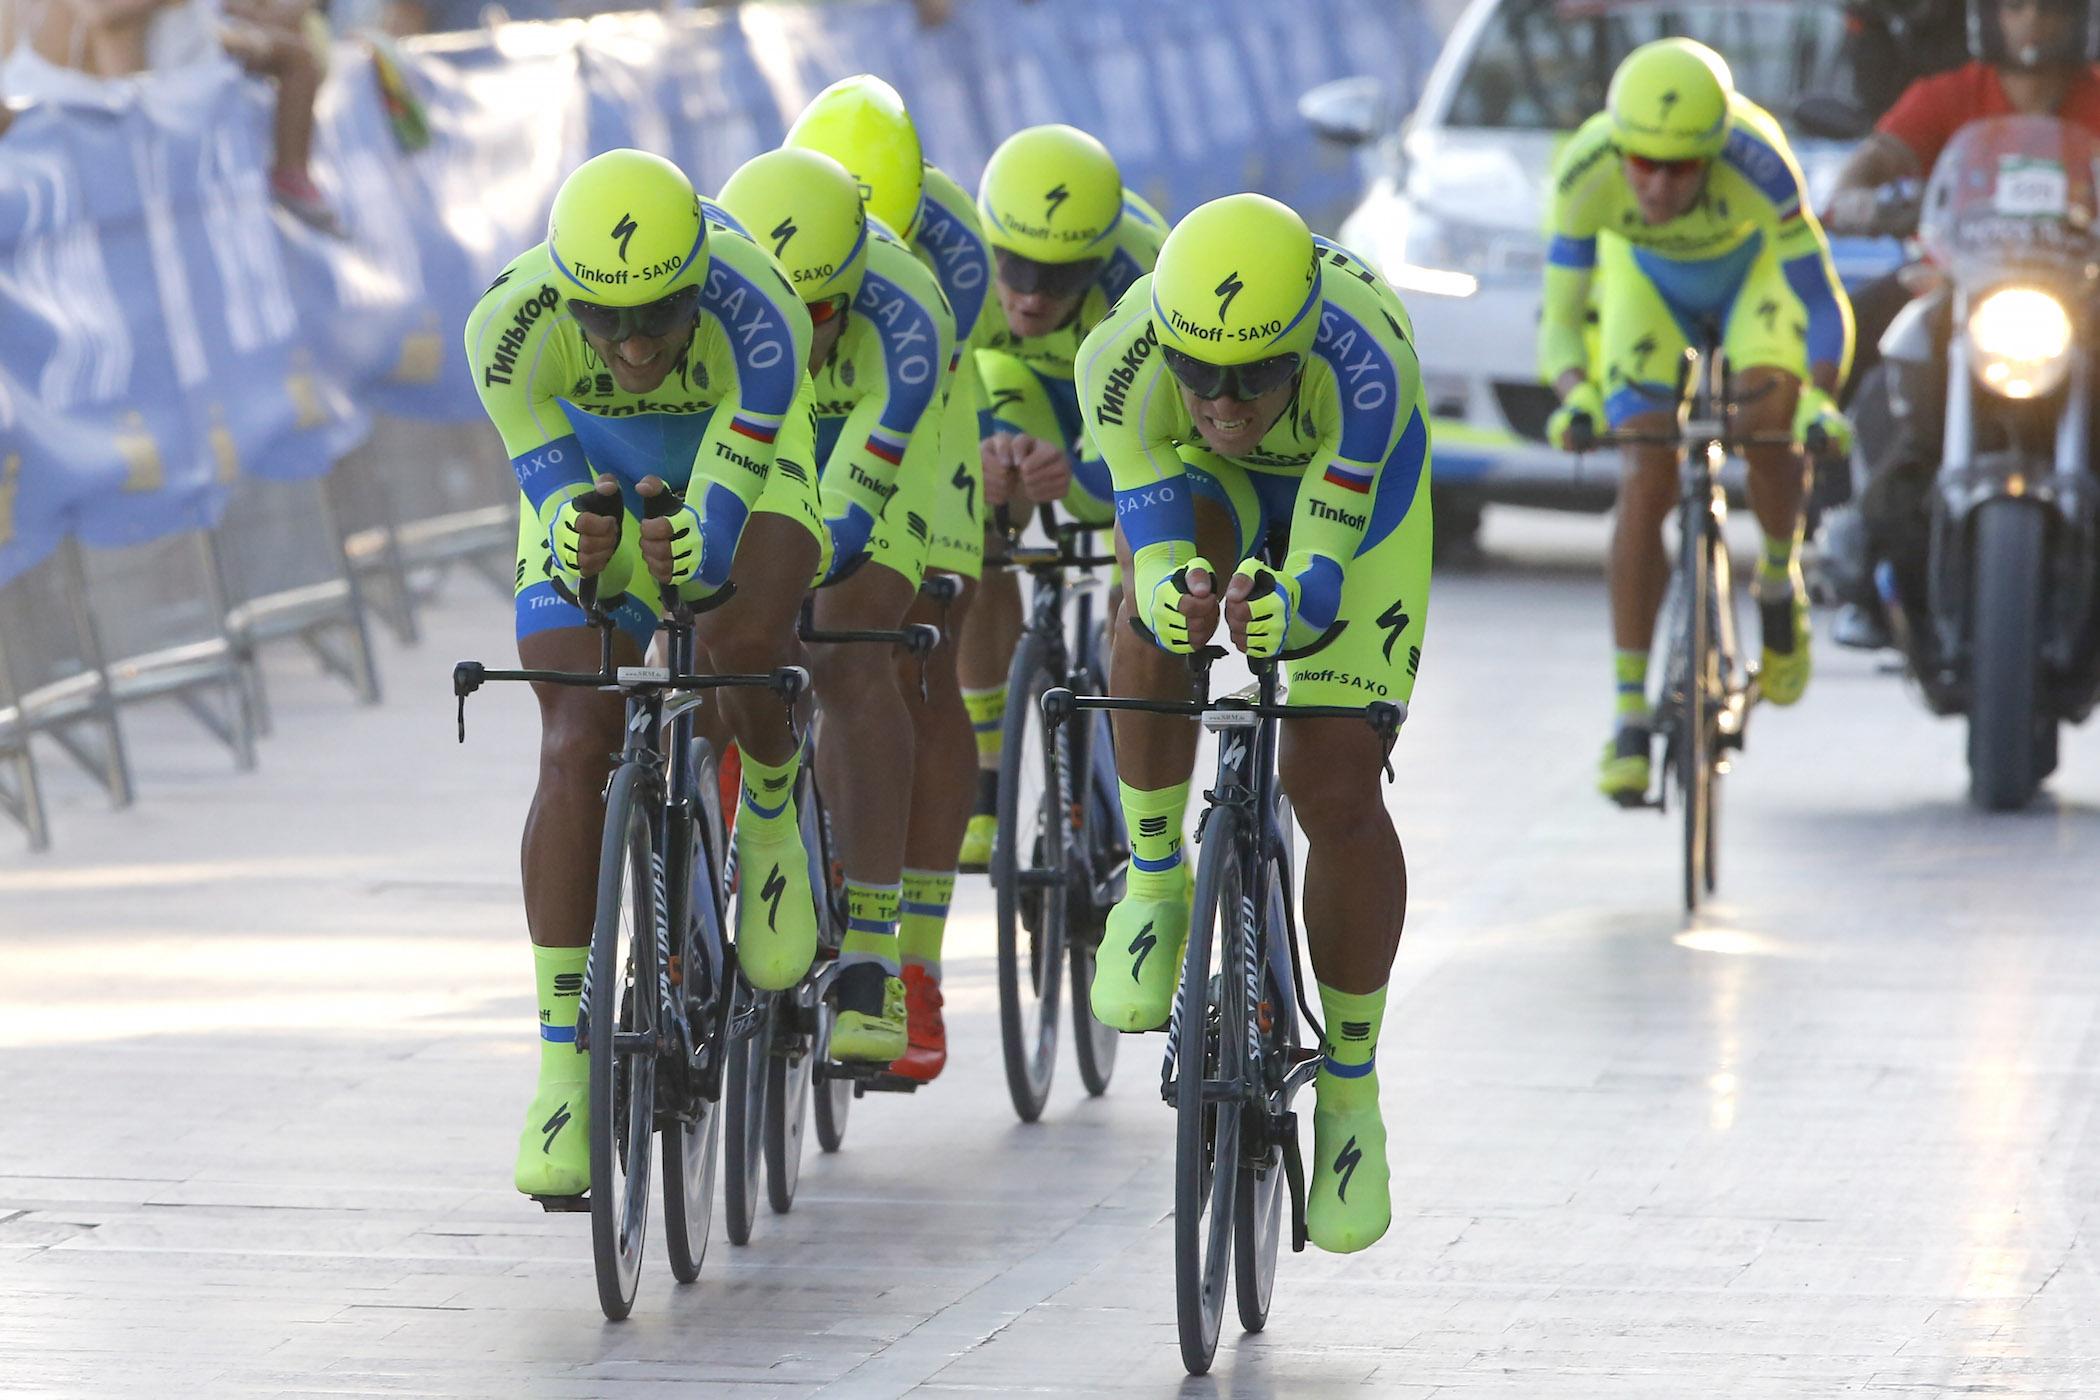 1 этап Вуэльты Испании 2015: Porto Banus - Marbella 7.4 км - 22/08/2015 - Tinkoff - Saxo - фото Luca Bettini